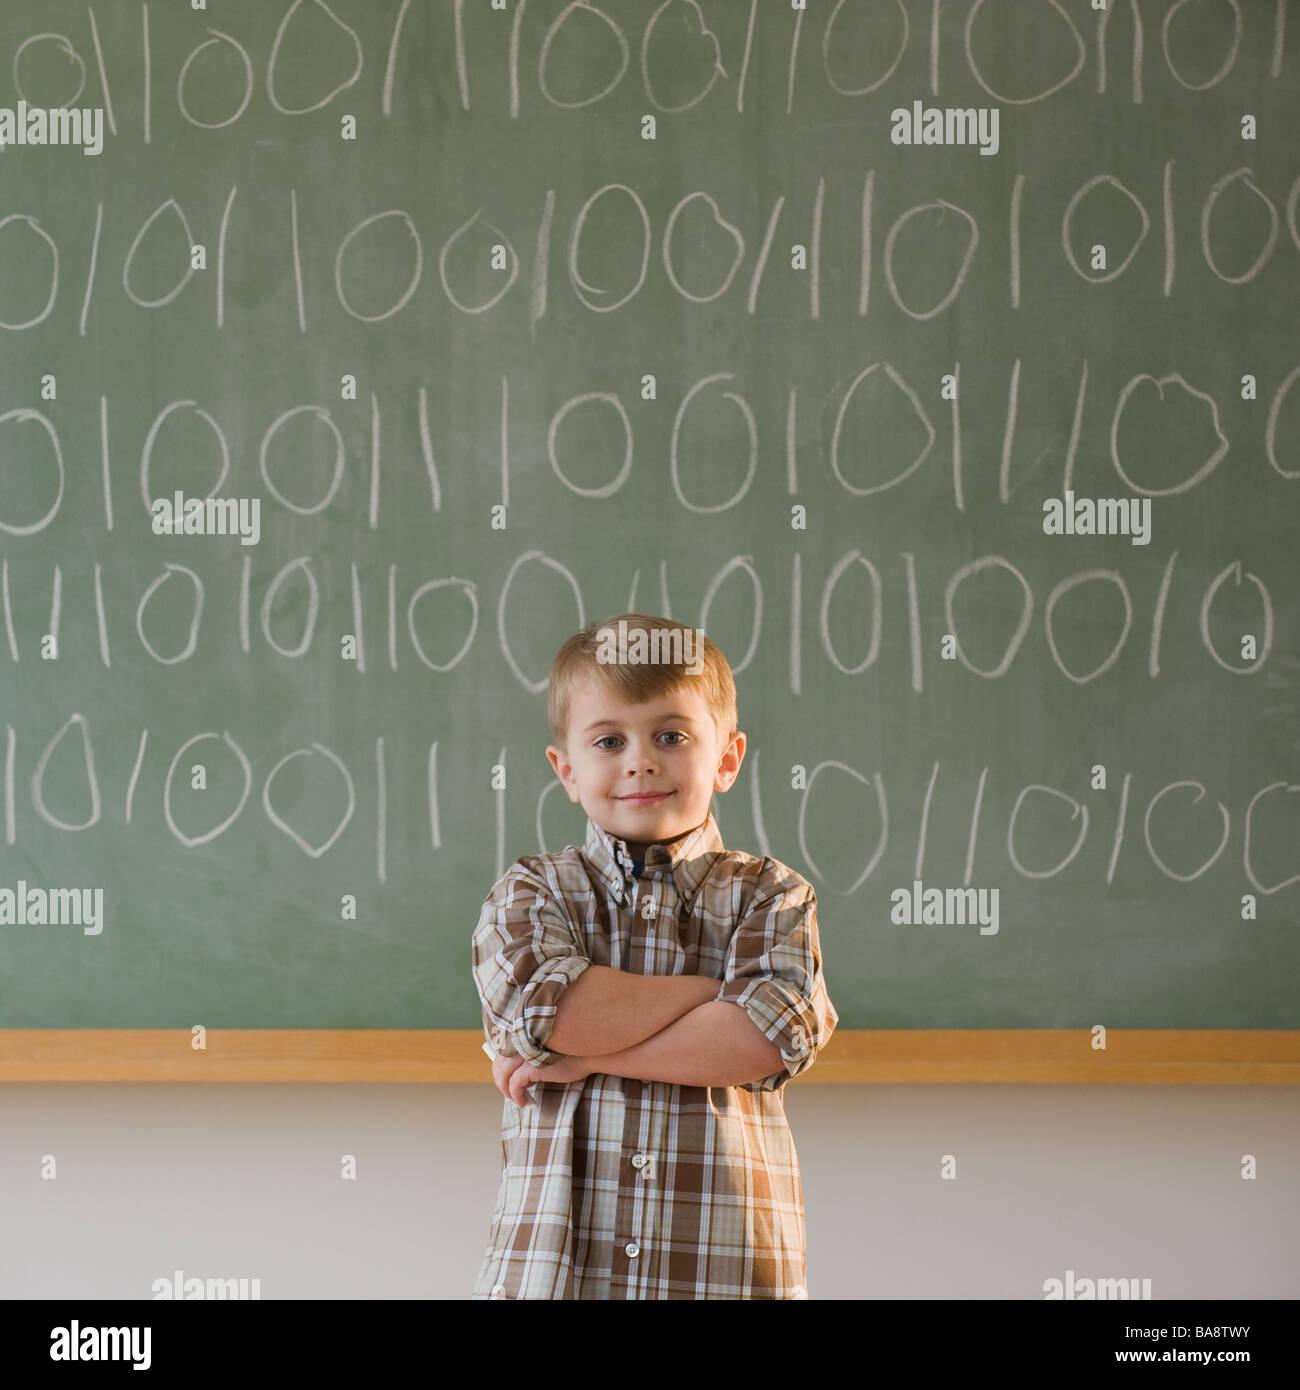 Boy writing binary code on blackboard - Stock Image